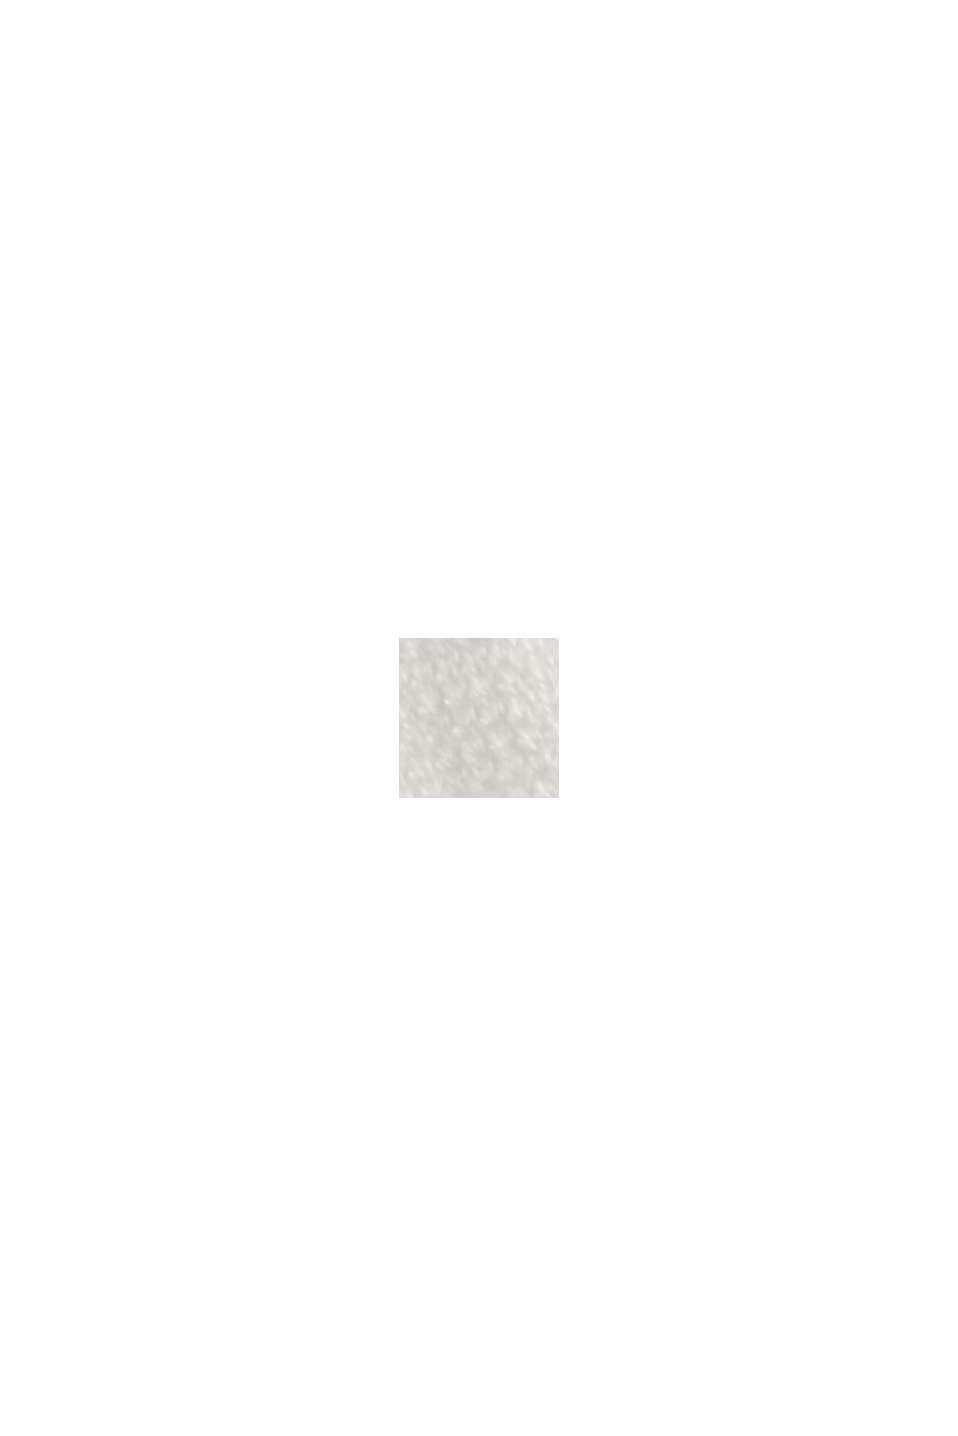 Pull-over à rayures ajourées, 100% coton biologique, OFF WHITE, swatch